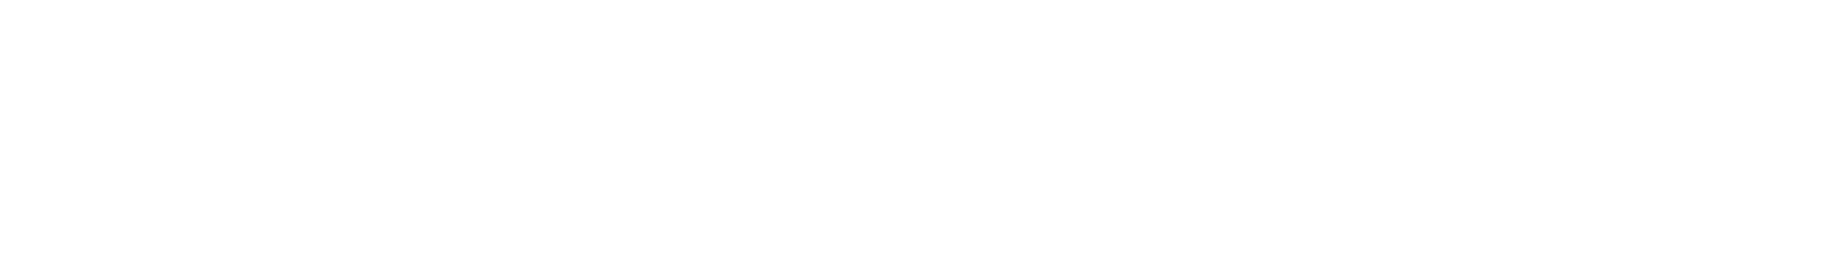 DC01.png